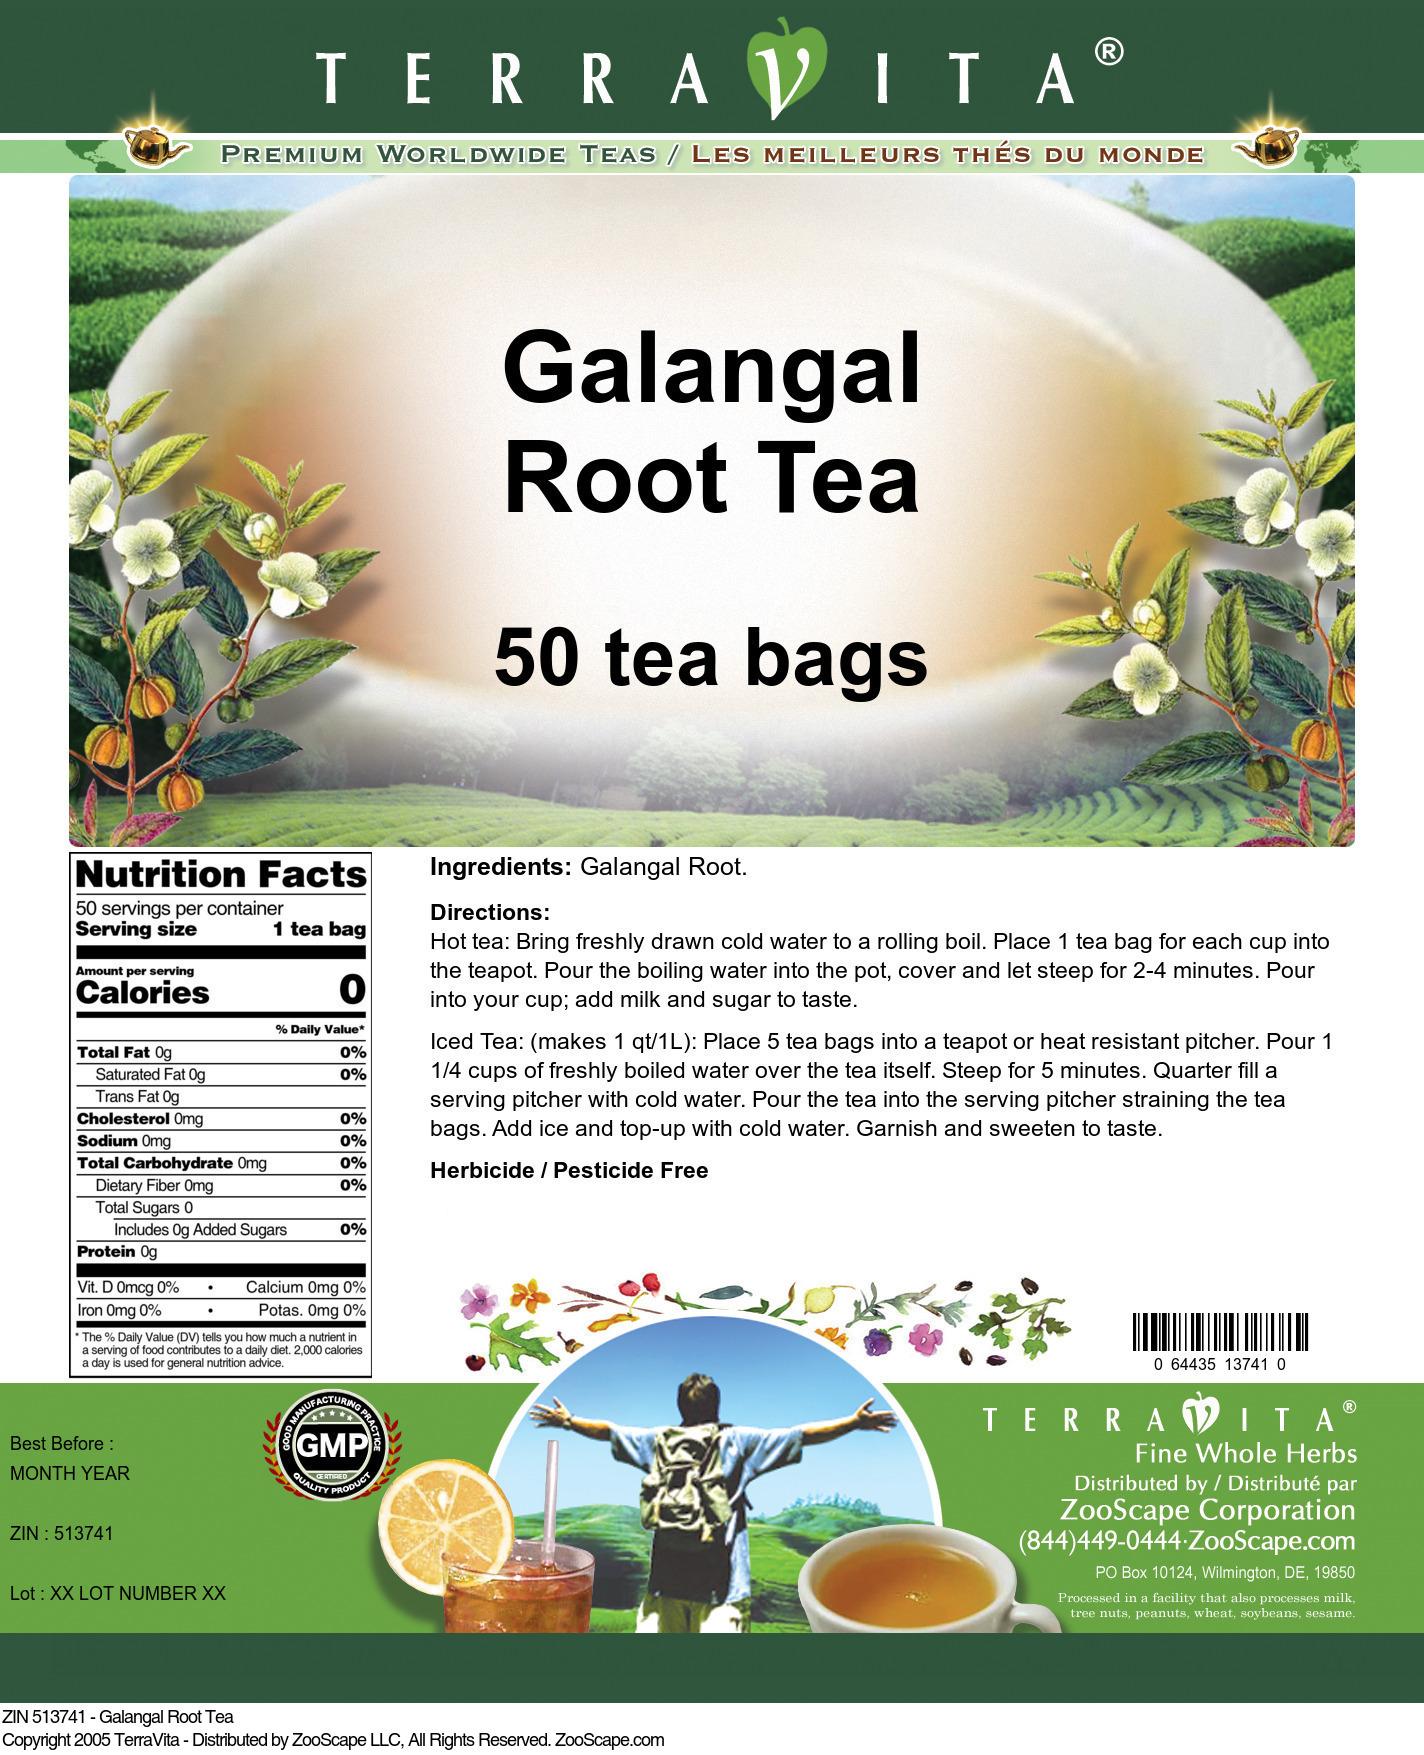 Galangal Root Tea